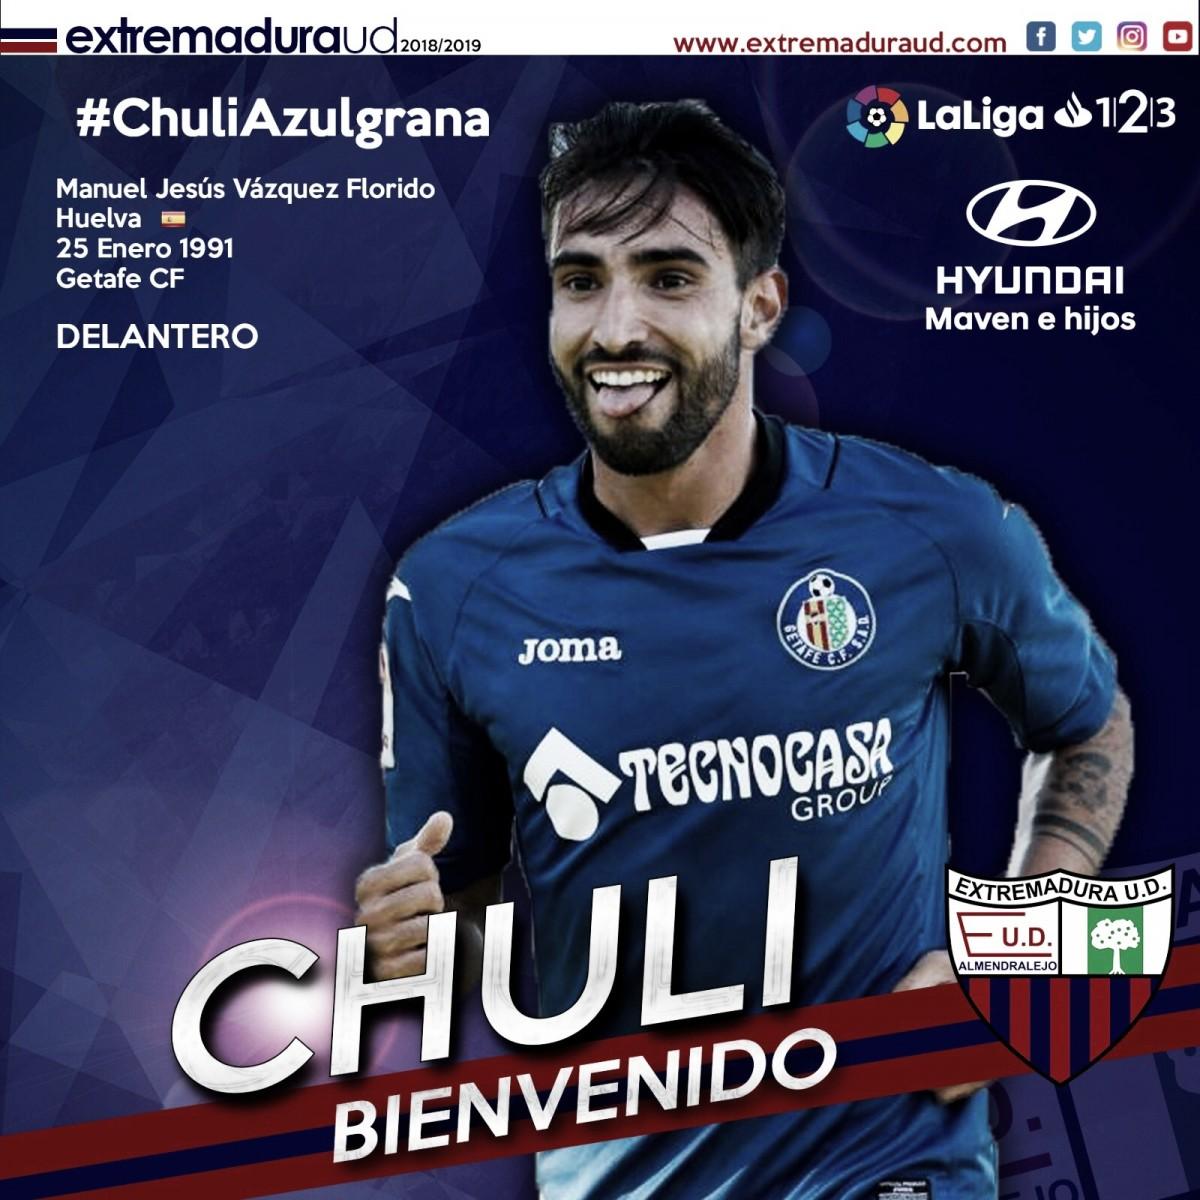 Chuli refuerza el ataque del Extremadura